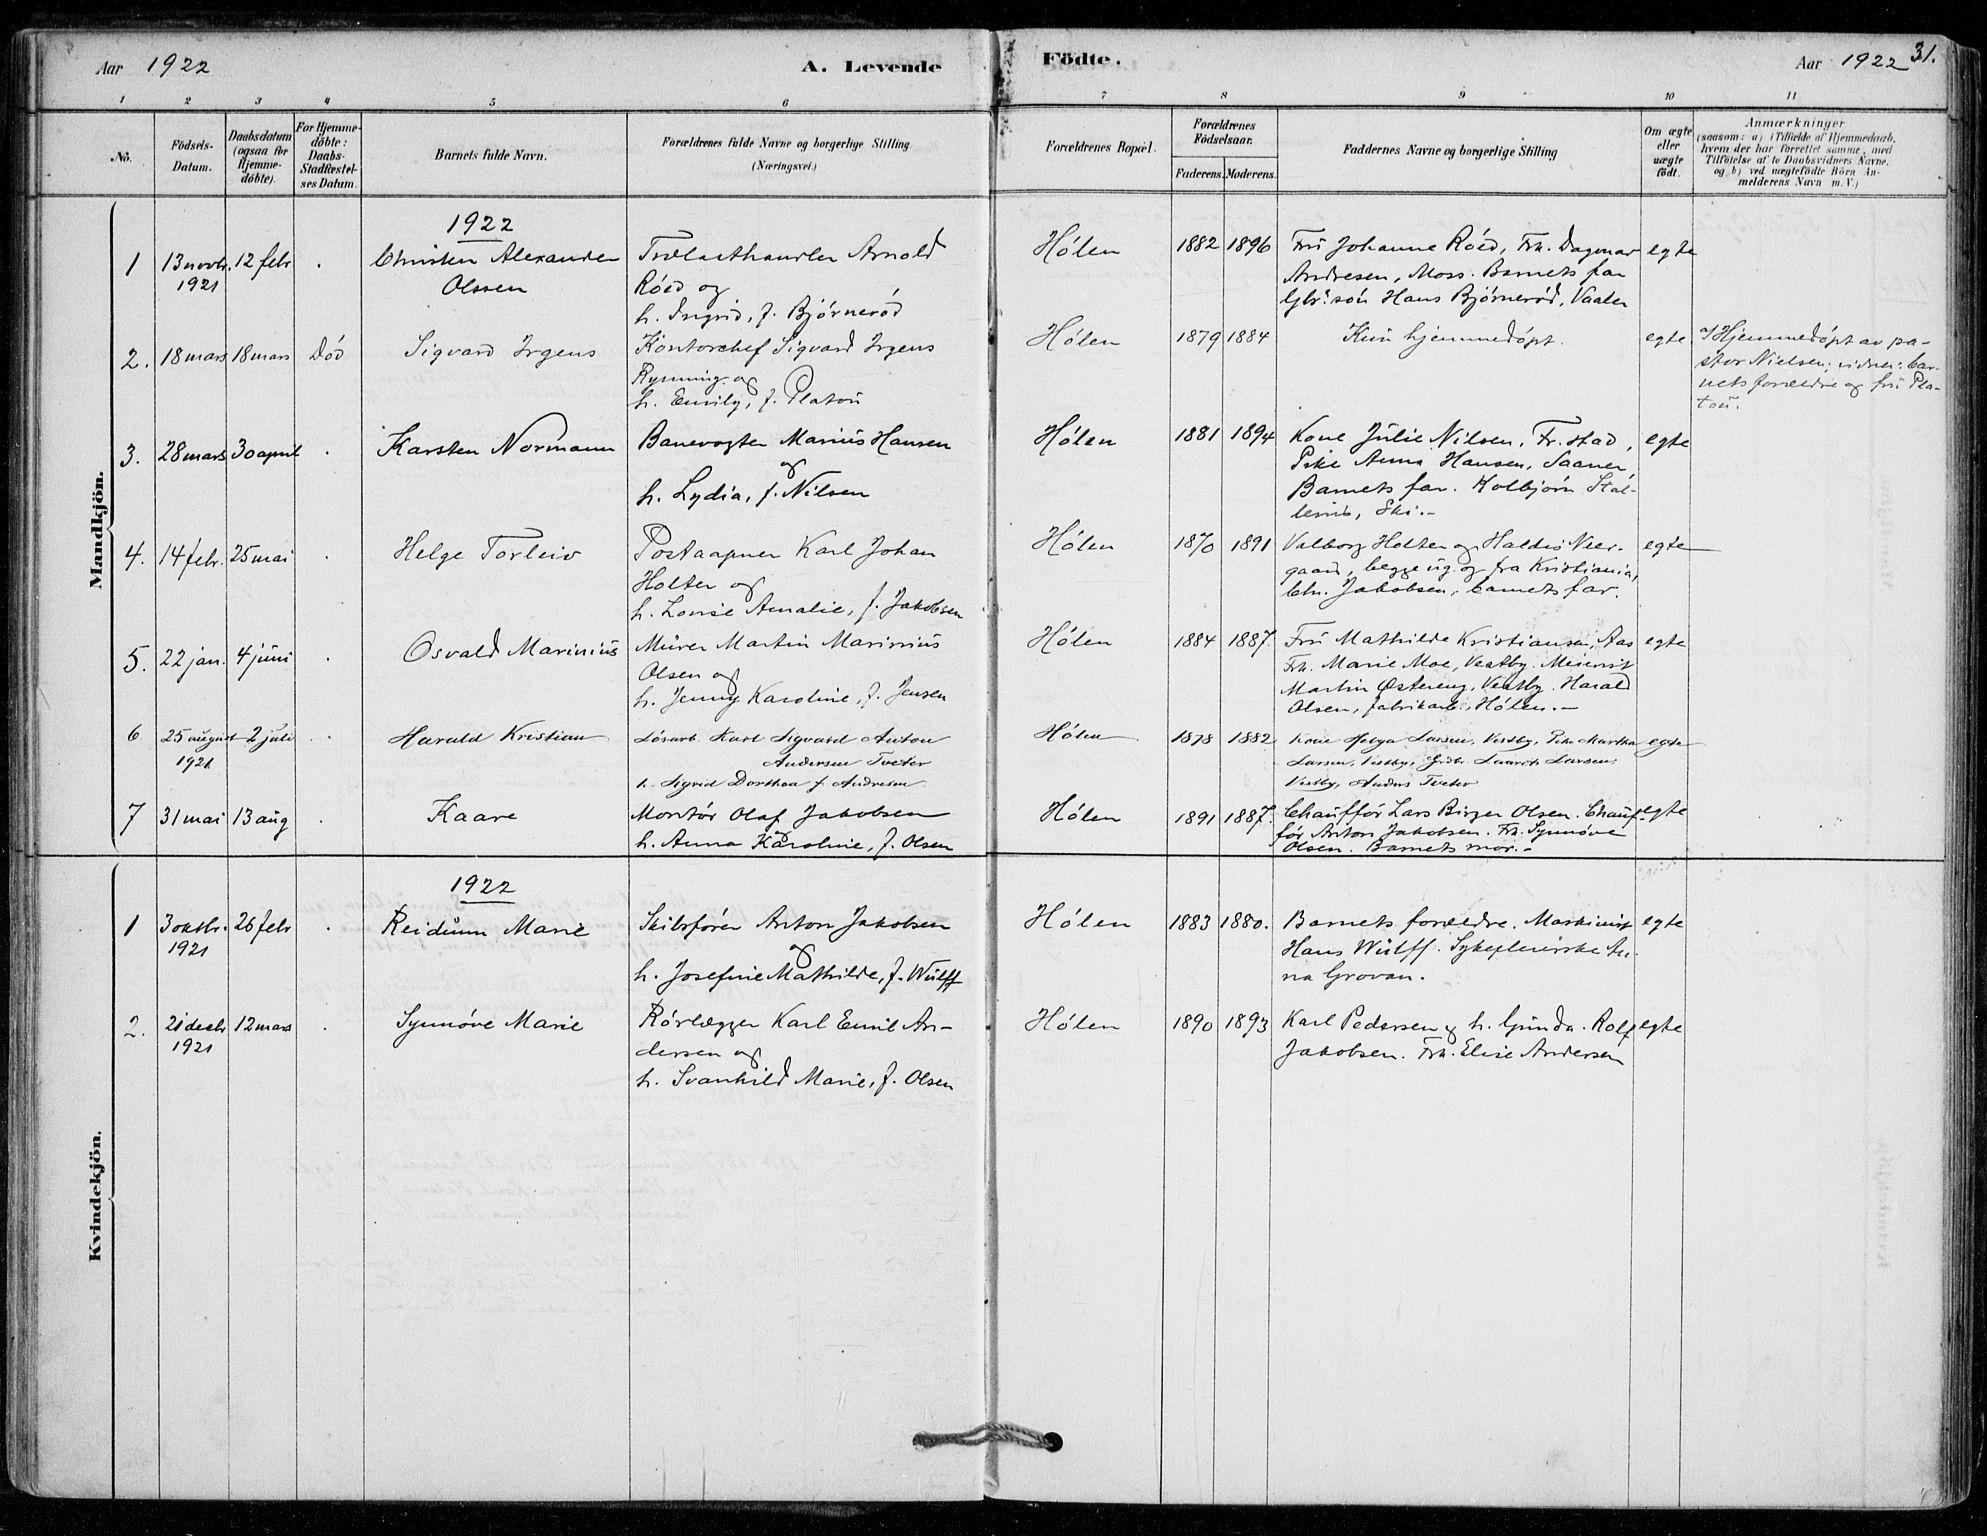 SAO, Vestby prestekontor Kirkebøker, F/Fe/L0001: Ministerialbok nr. V 1, 1878-1931, s. 31